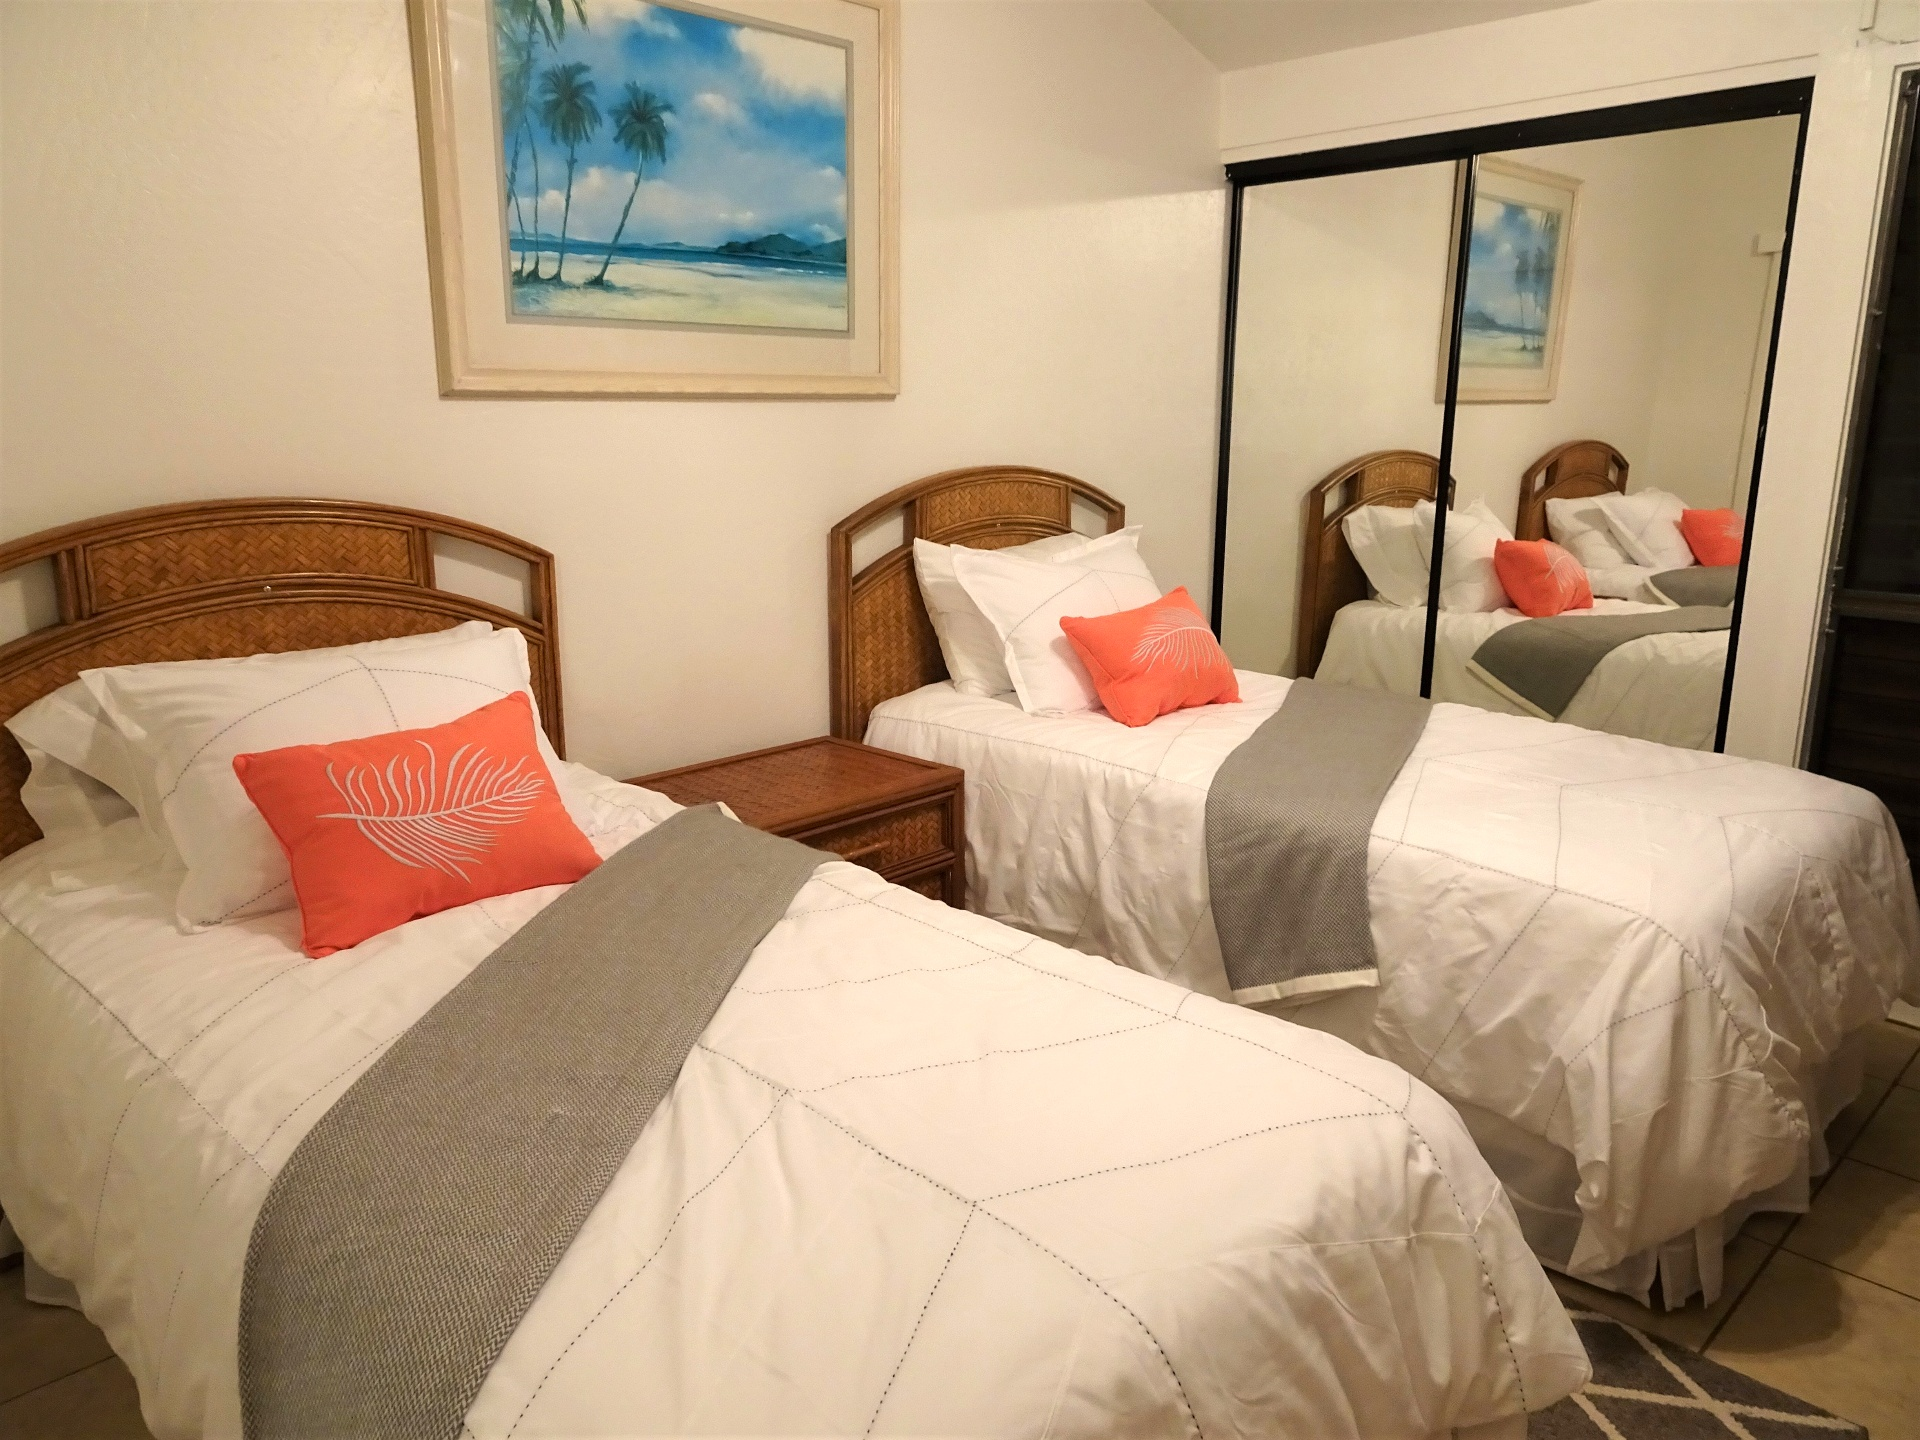 C20 Downstairs bedroom